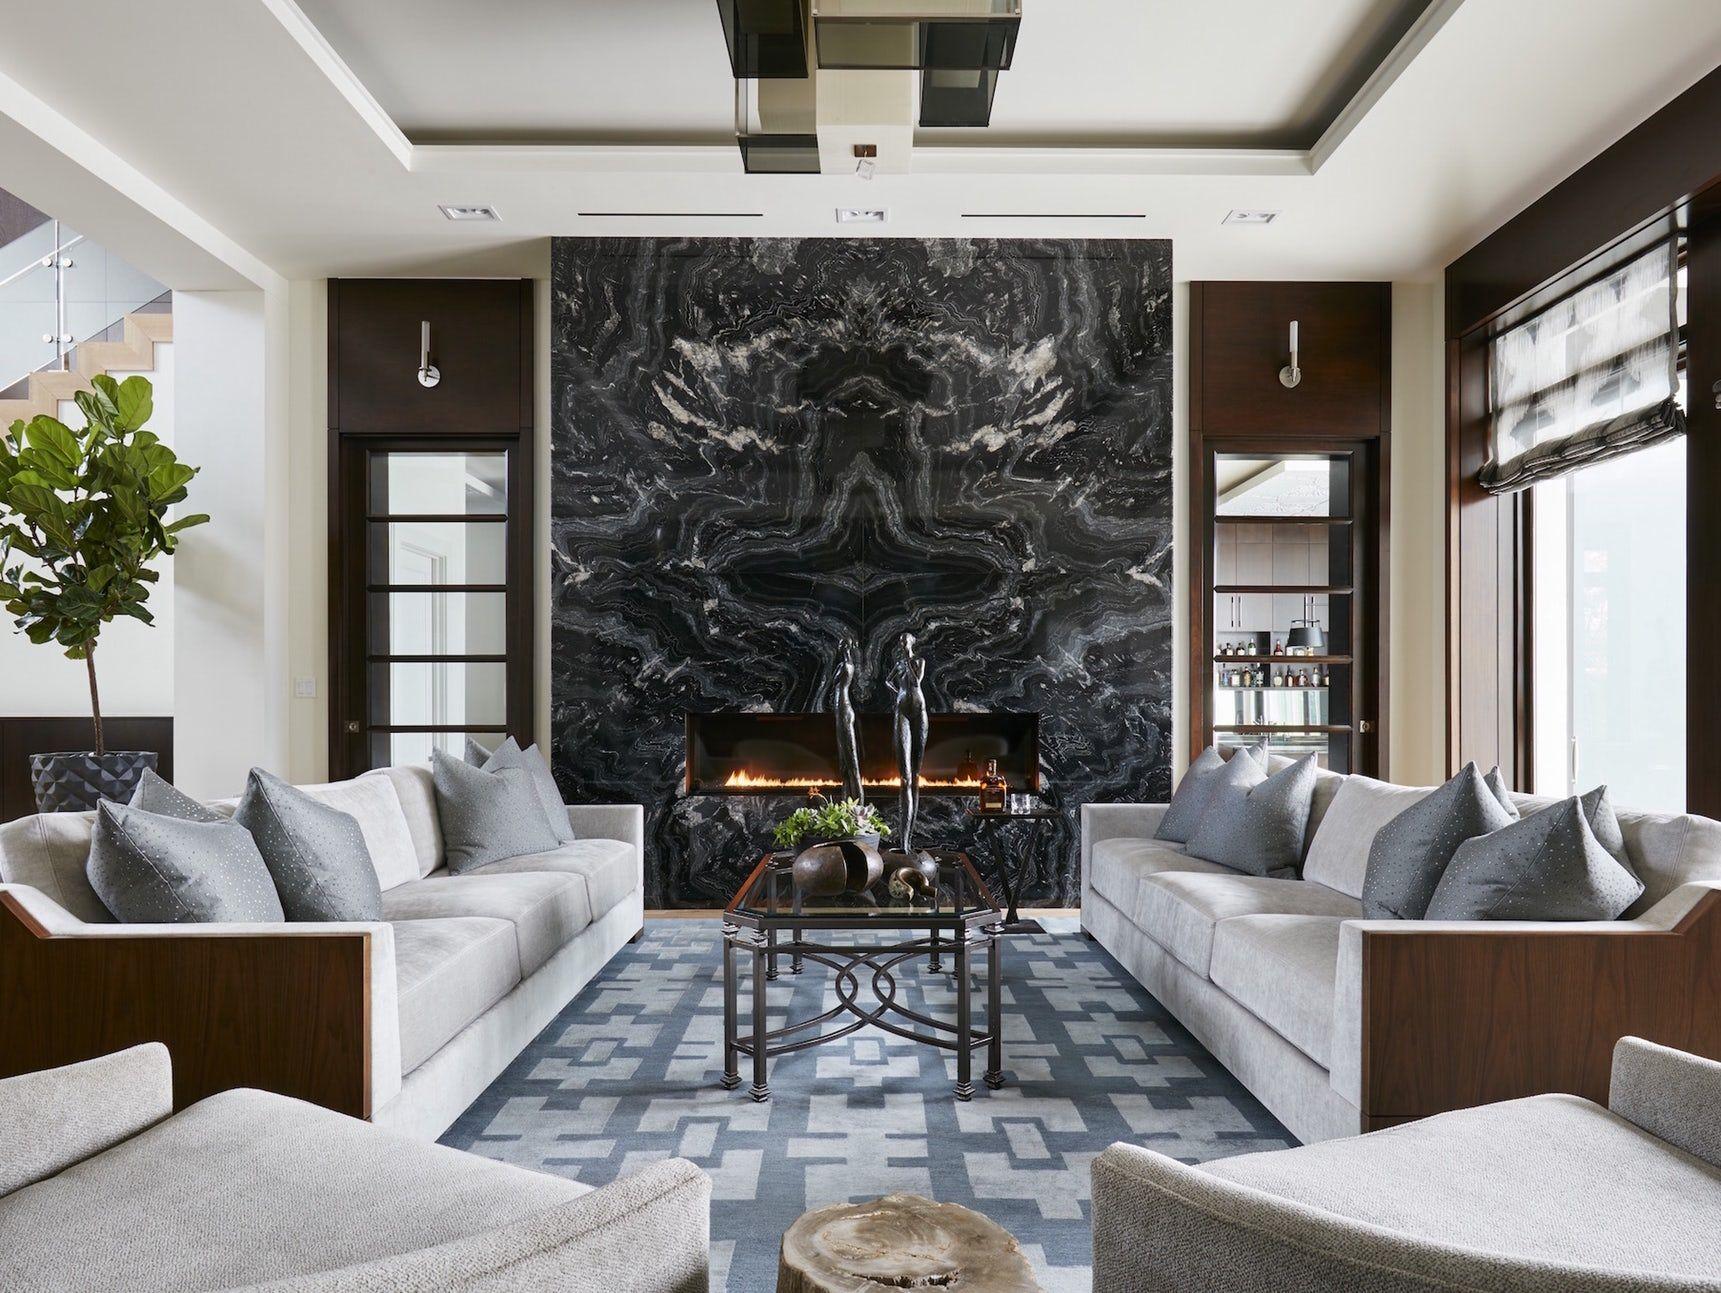 65 best fireplace ideas beautiful fireplace designs decor rh elledecor com images of shiplap fireplace walls images of fireplace feature walls